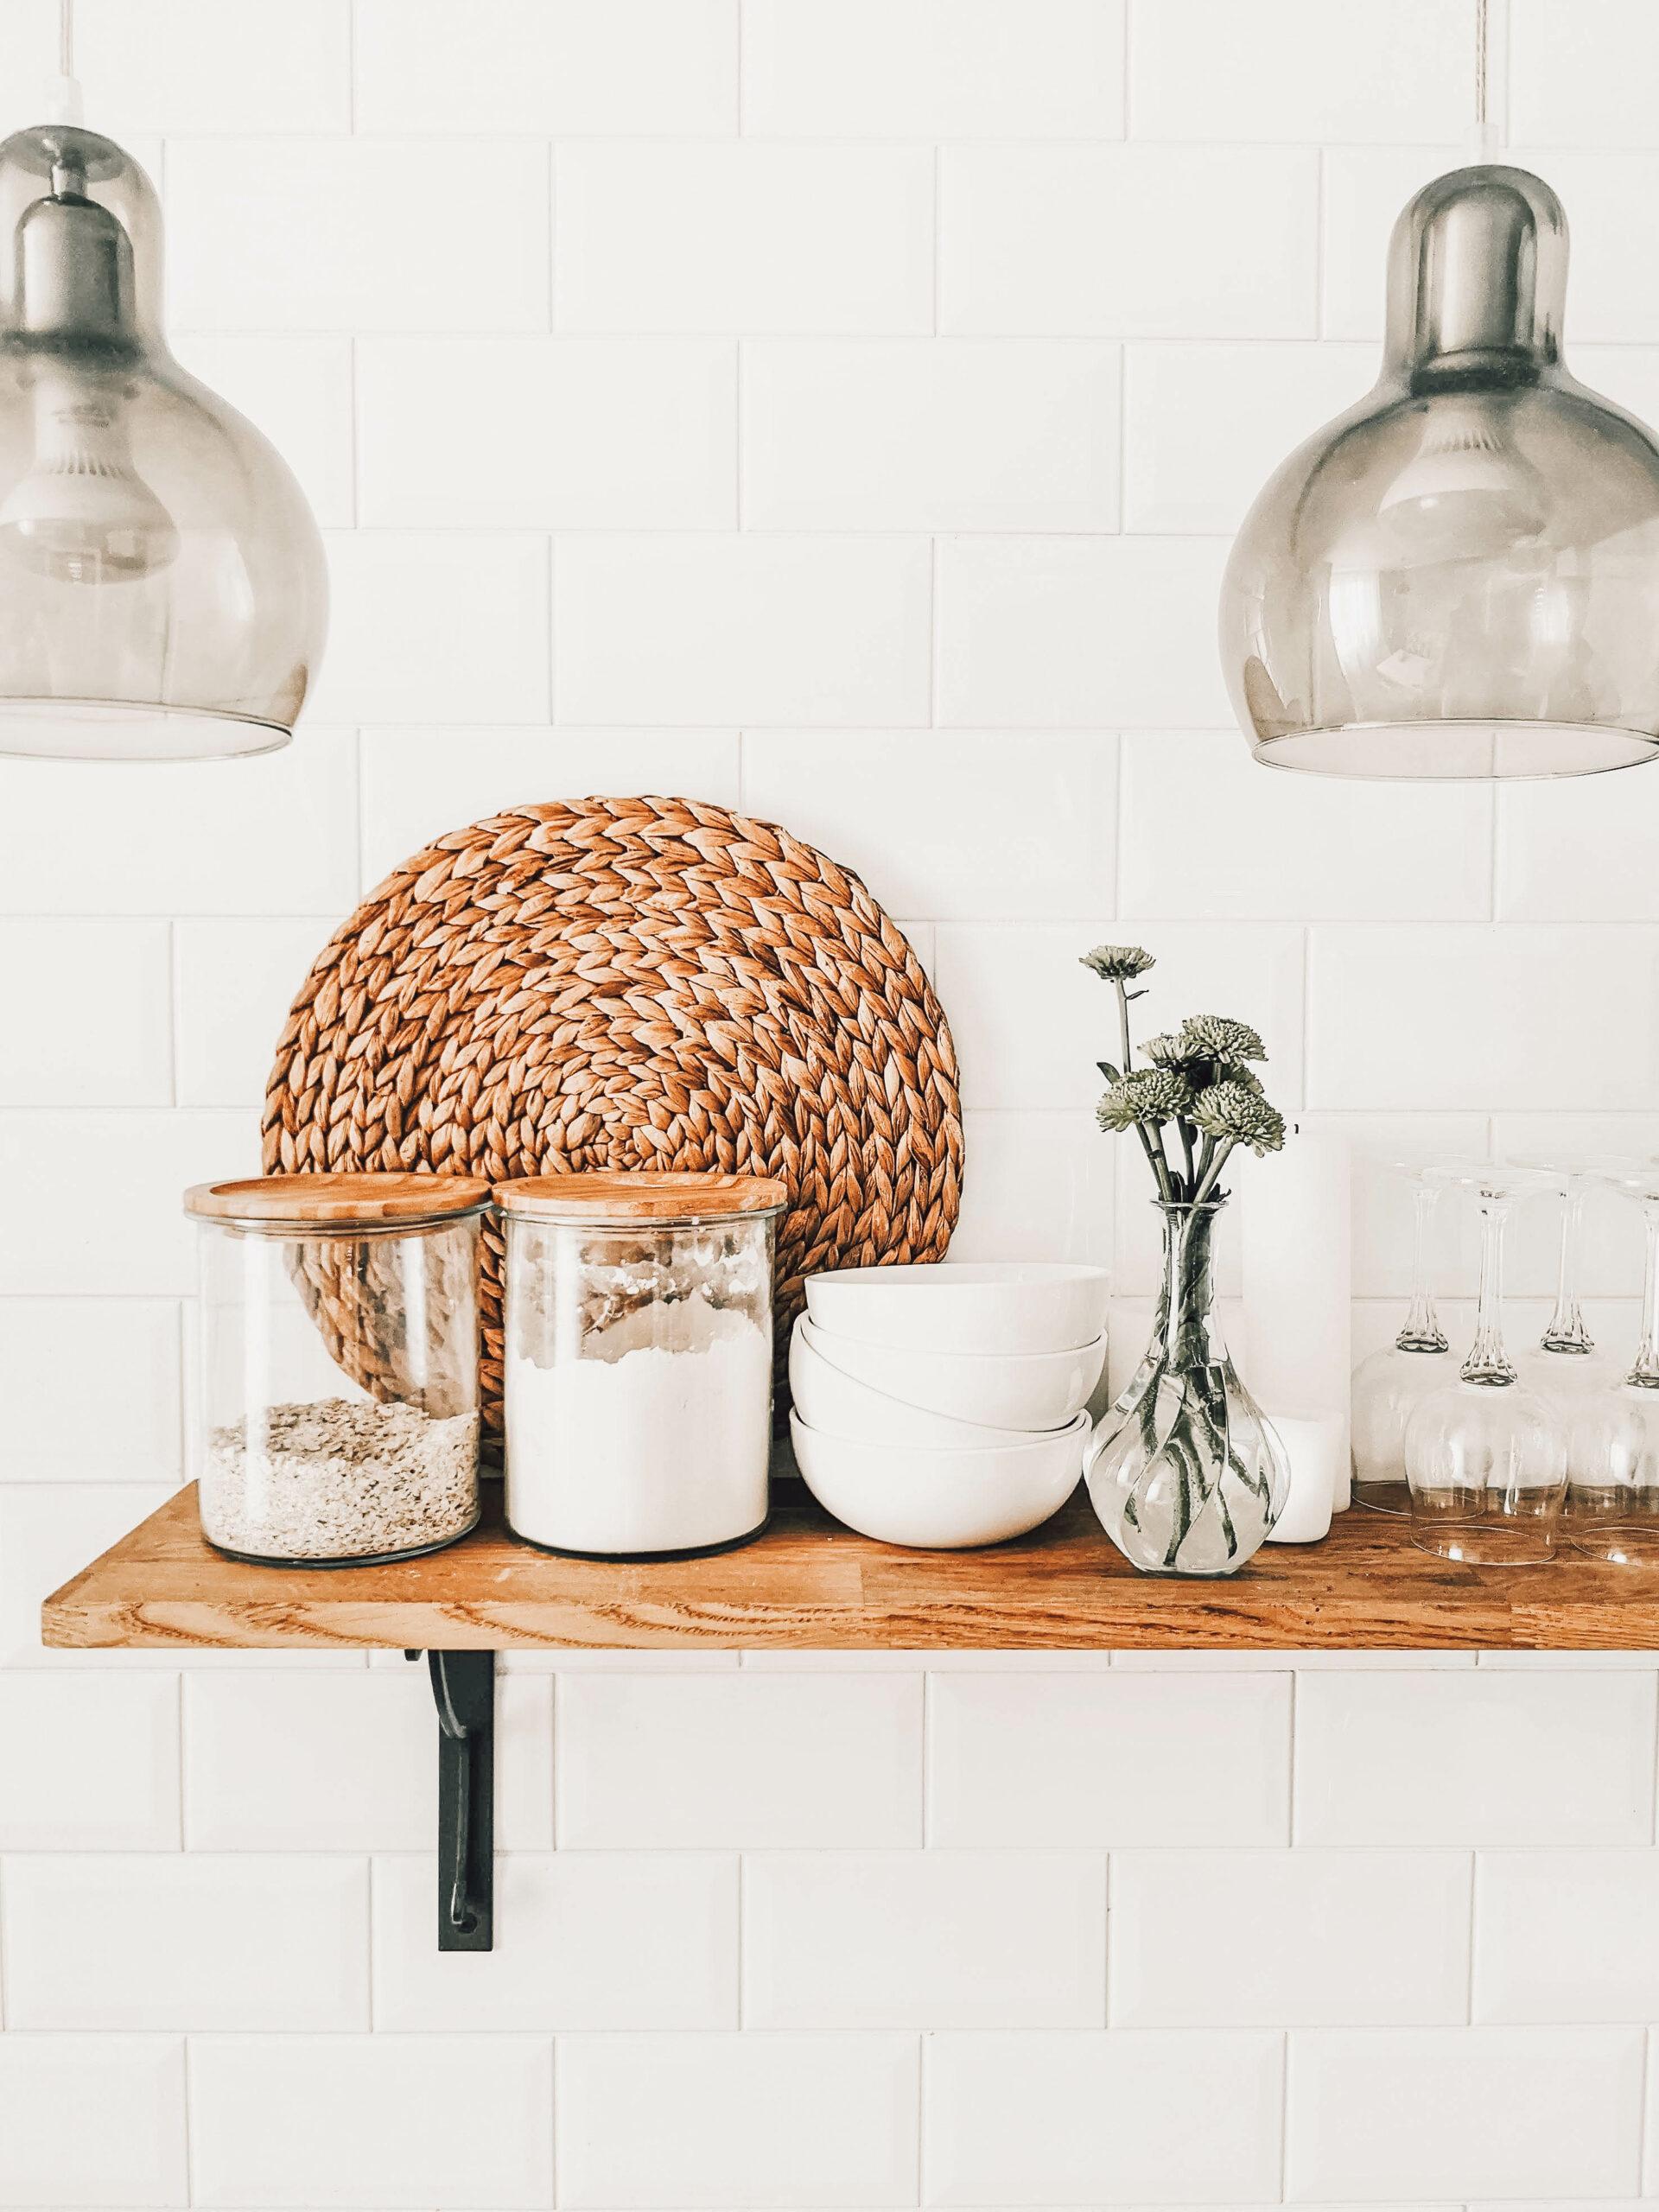 keuken-interieur-koken-eiland-toestellen-plaatsing-keukenplaatser